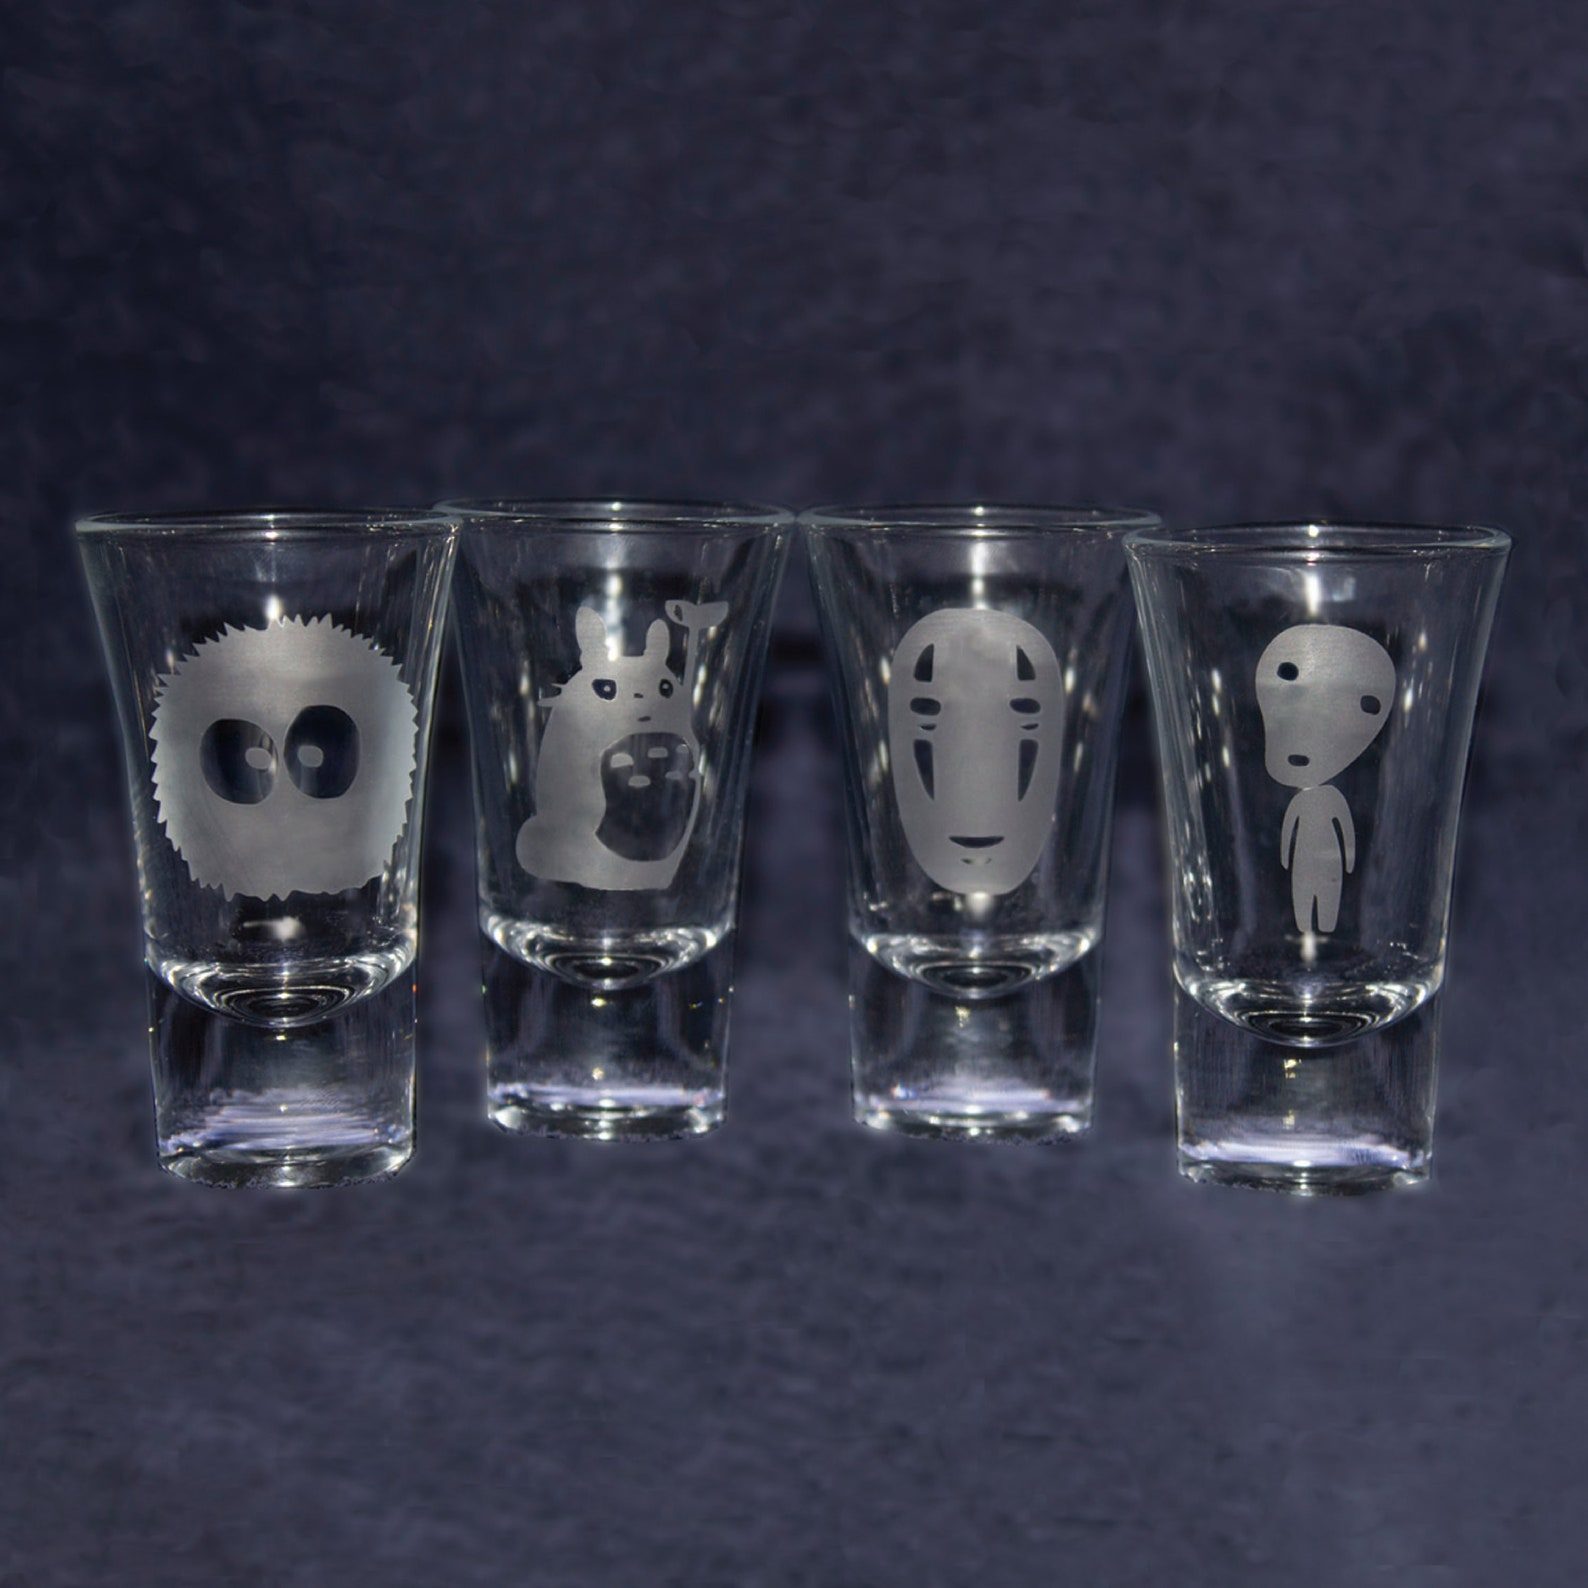 Studio Ghibli Shot Glasses. Set of 4 Etched Shot Glasses. Totoro, Soot Sprite, No face, Kodama spirit. My Neighbor Totoro, Spirited Away